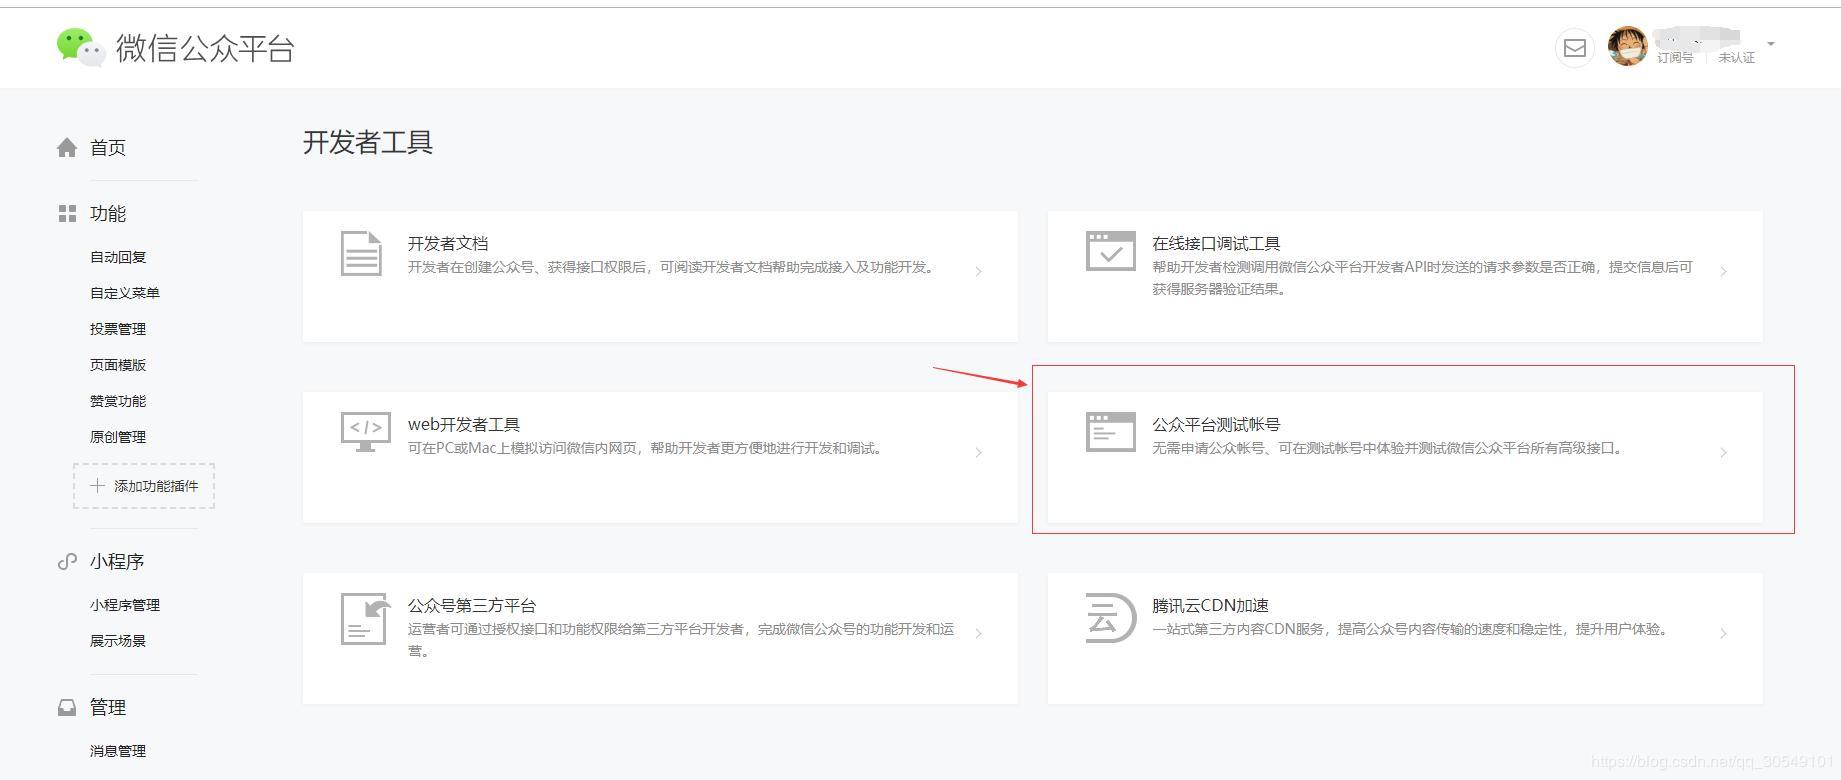 WeChat public number development -- test number - basic